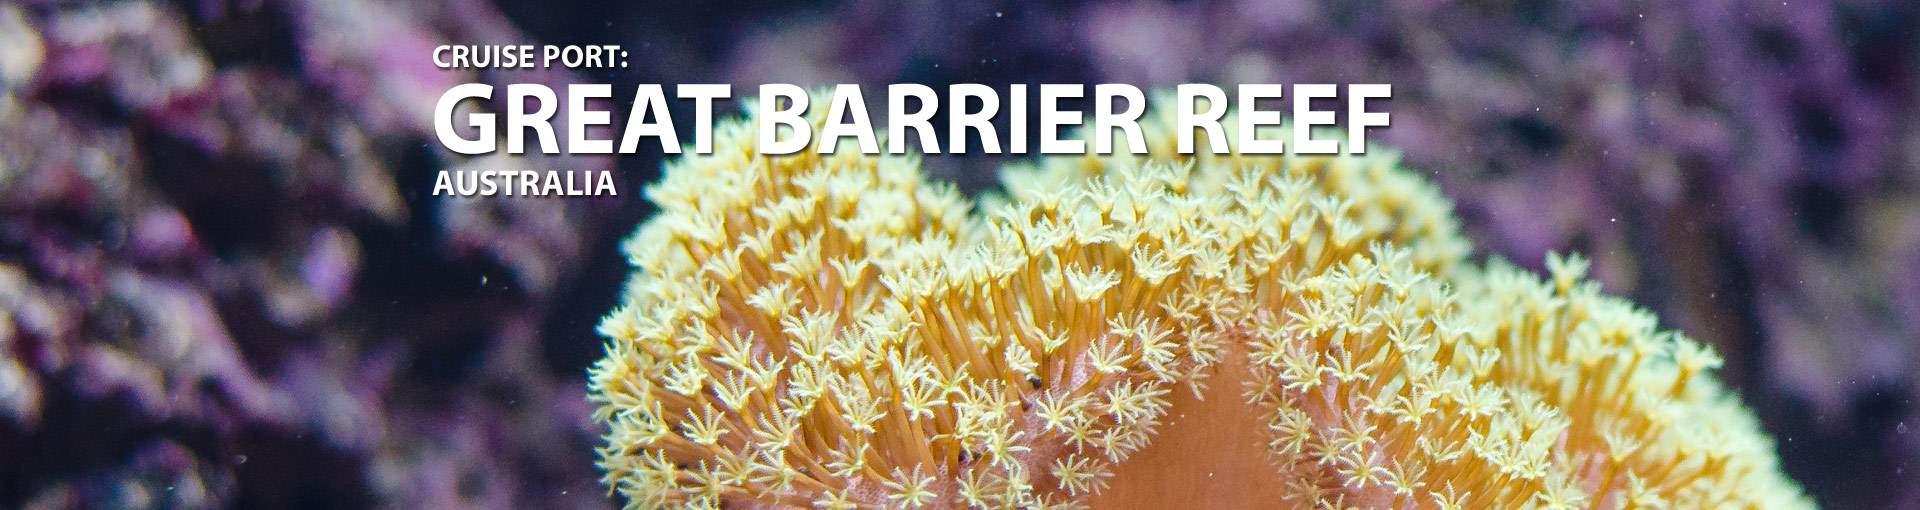 Great Barrier Reef, Australia Cruise Port